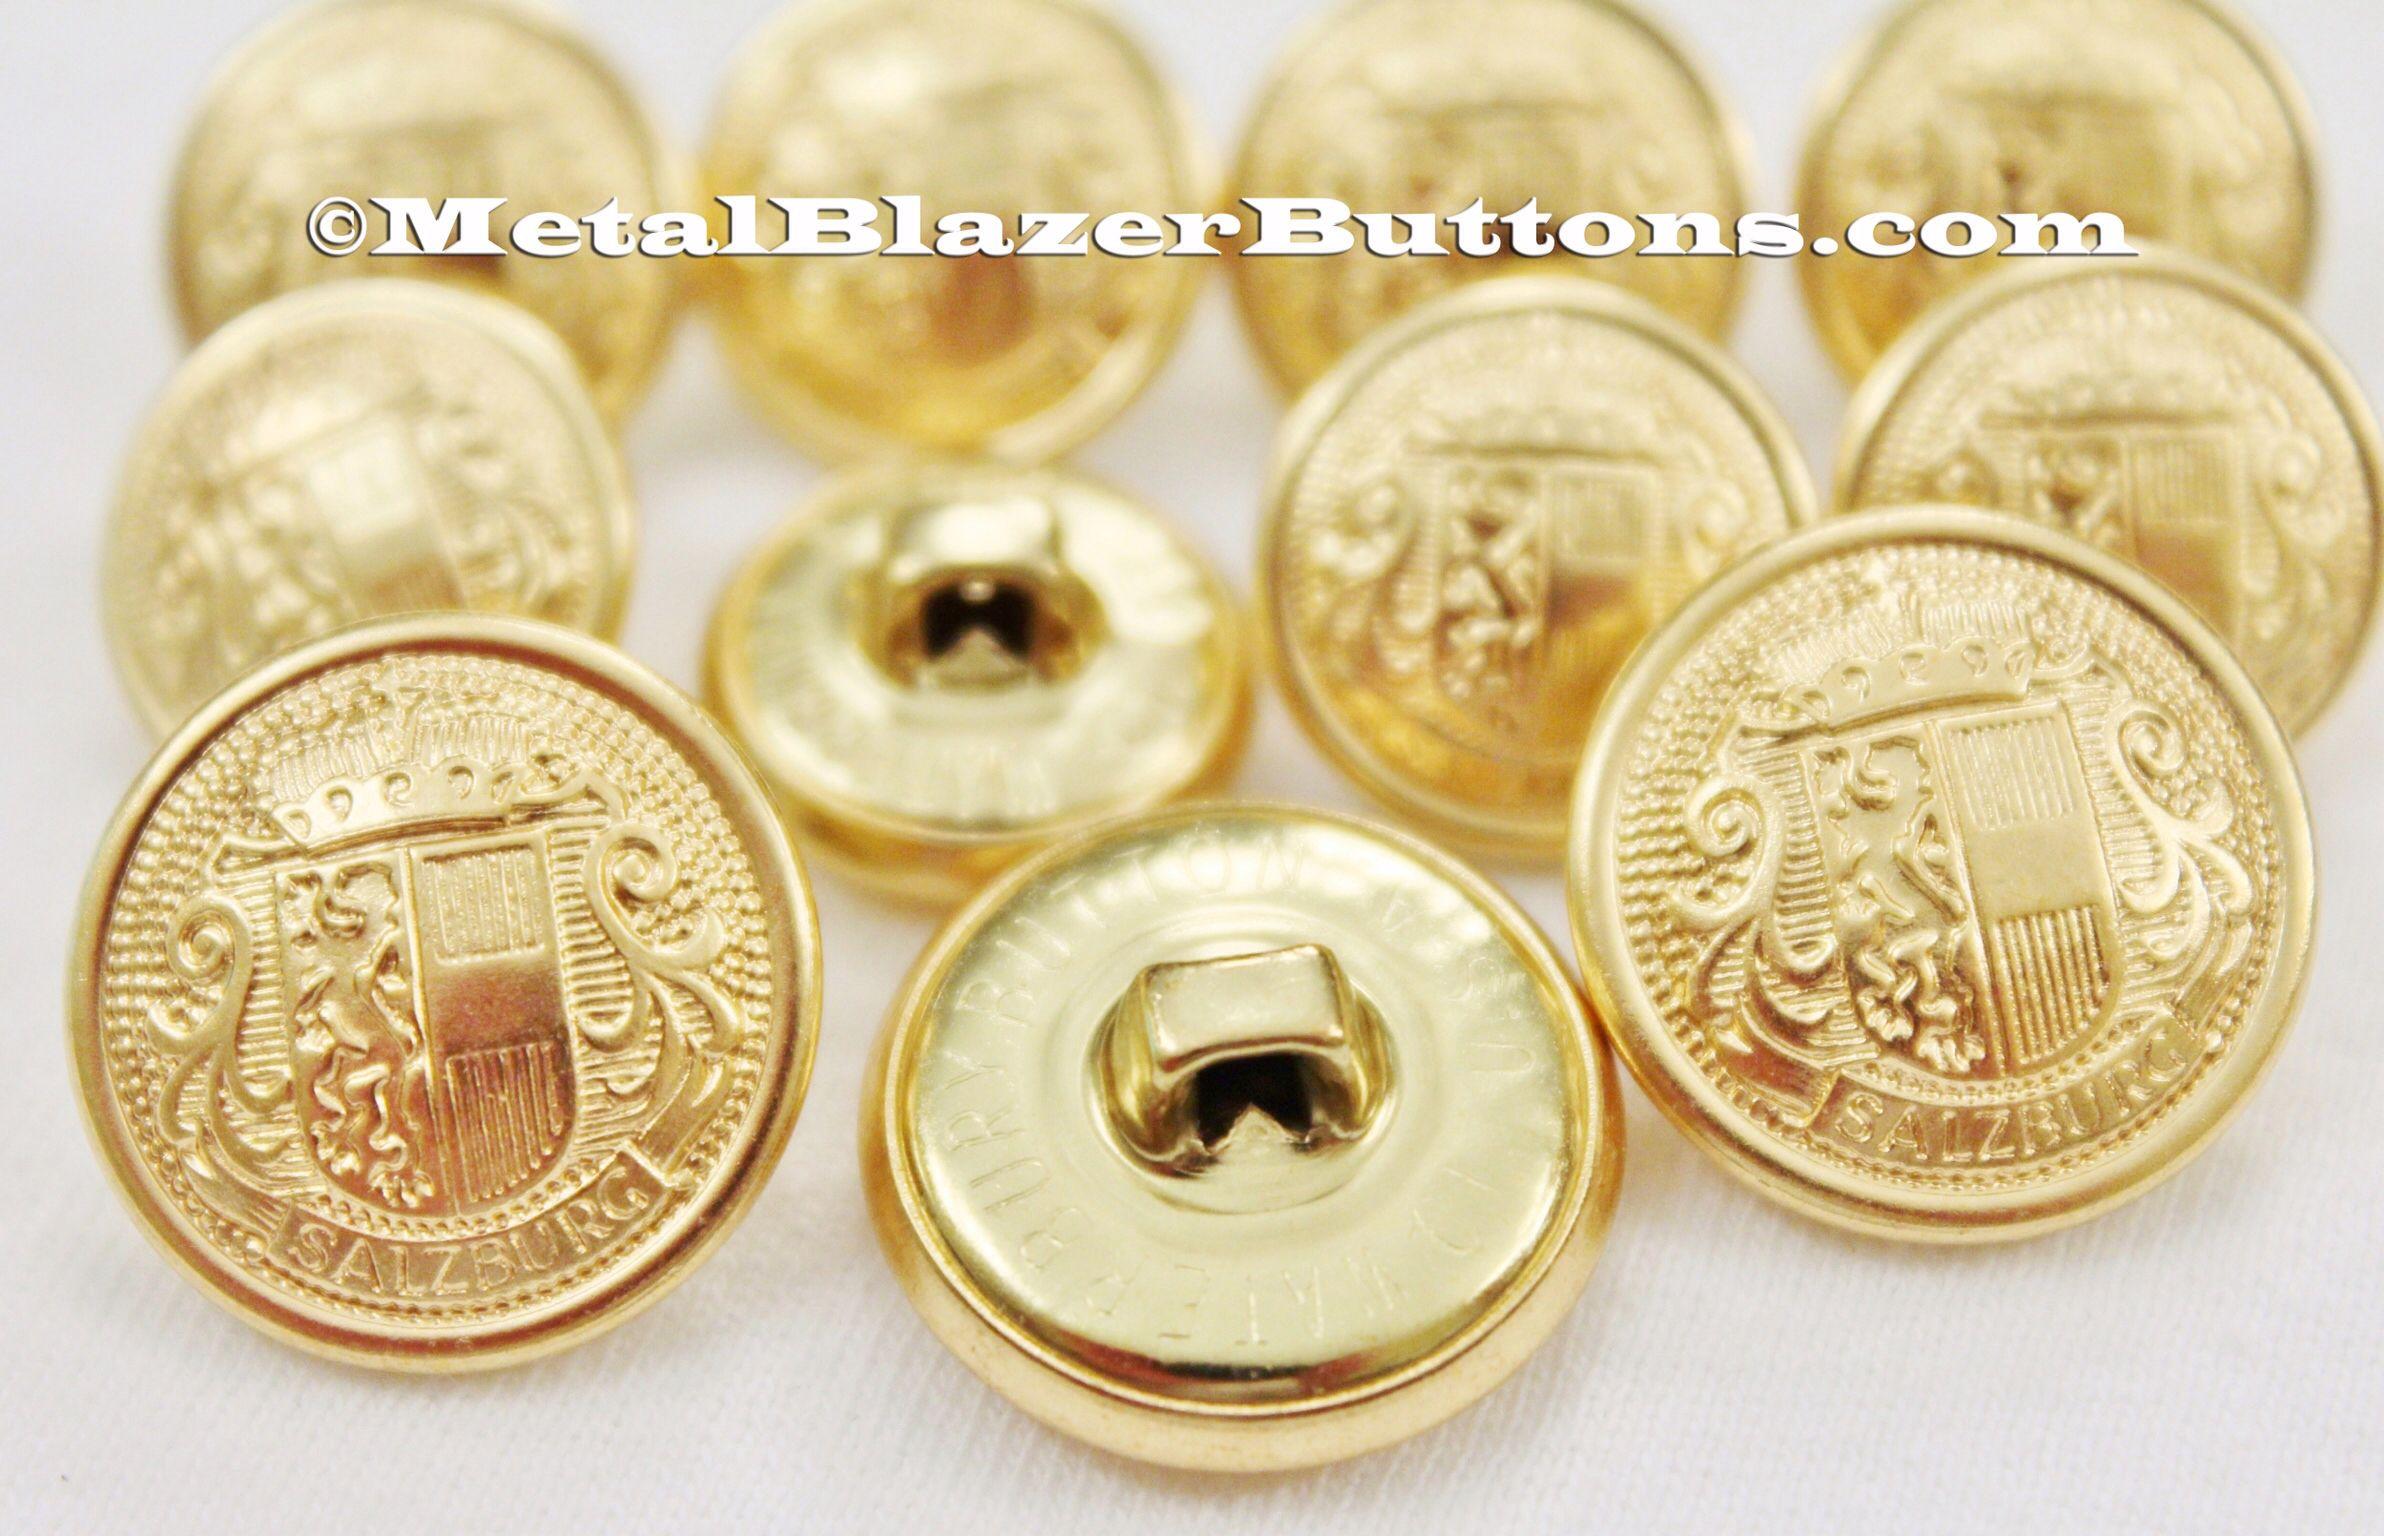 Blazer Sport Coat 11 Antique Gold Shank Military Buttons Set for Suit Jackets